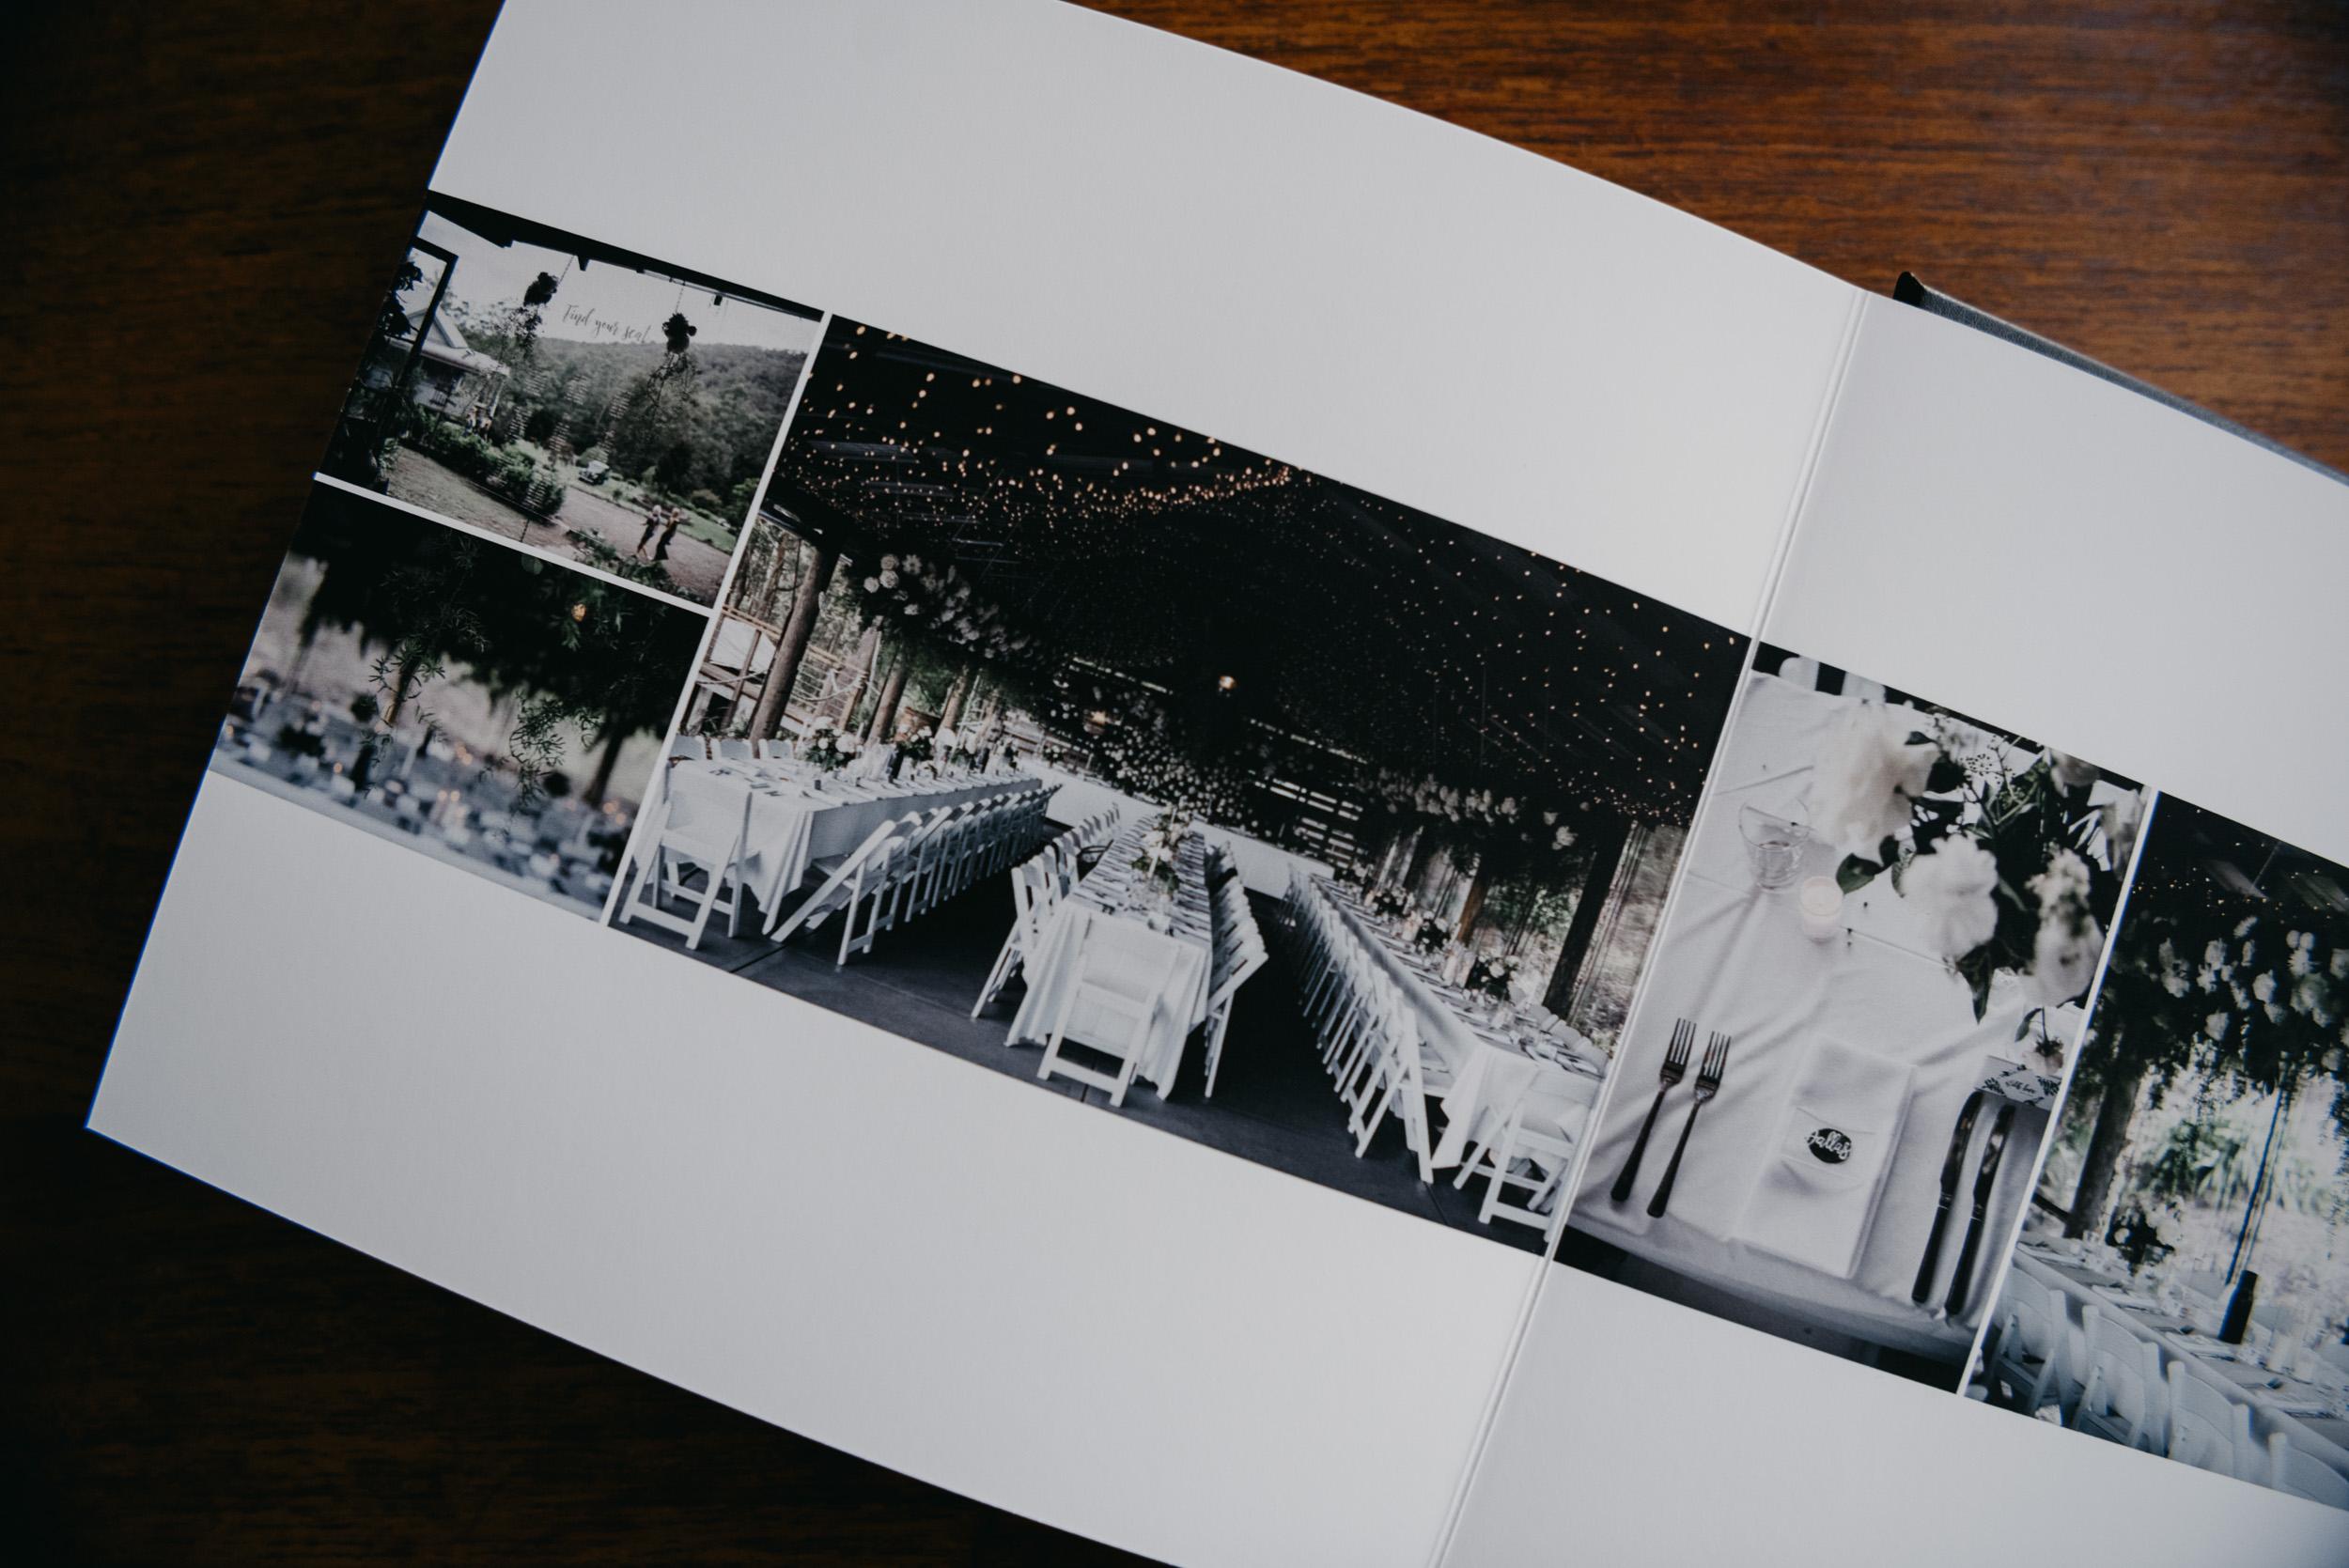 Fine_art_wedding_album_jason_corroto-Photo (11 of 11).jpg